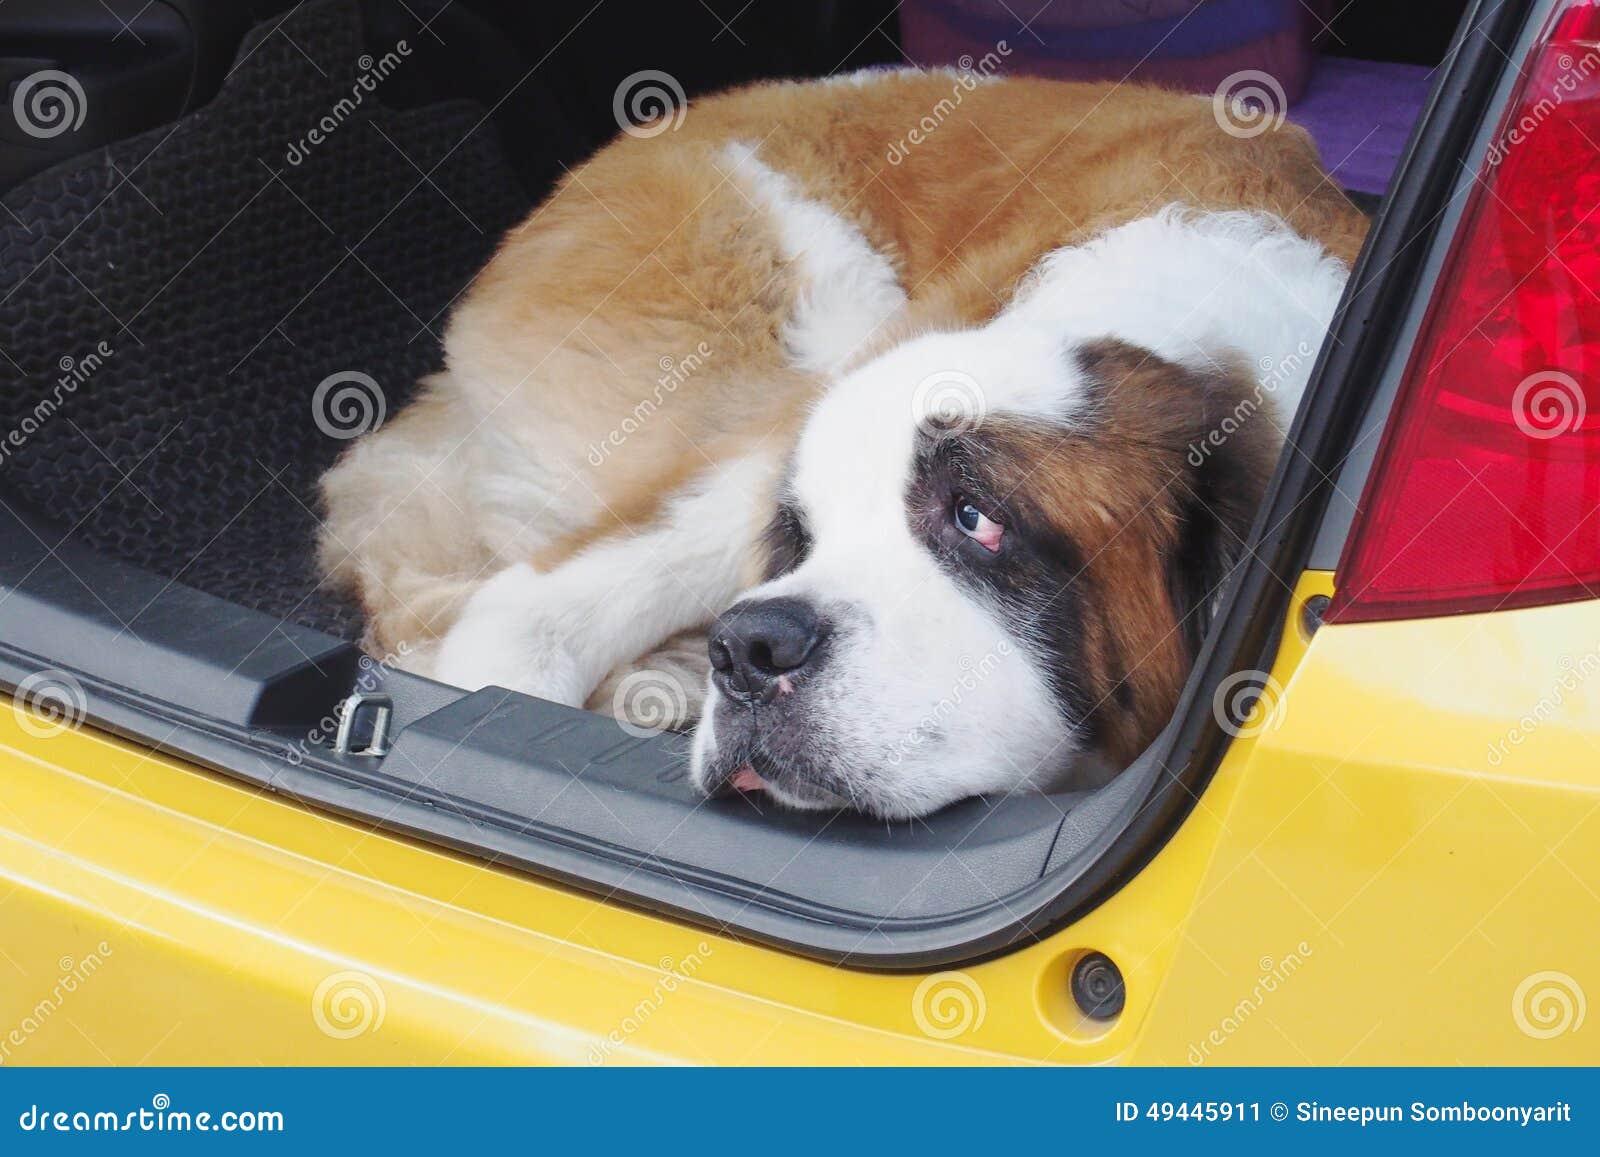 bernhardiner hund der im auto hockt stockbild bild 49445911. Black Bedroom Furniture Sets. Home Design Ideas